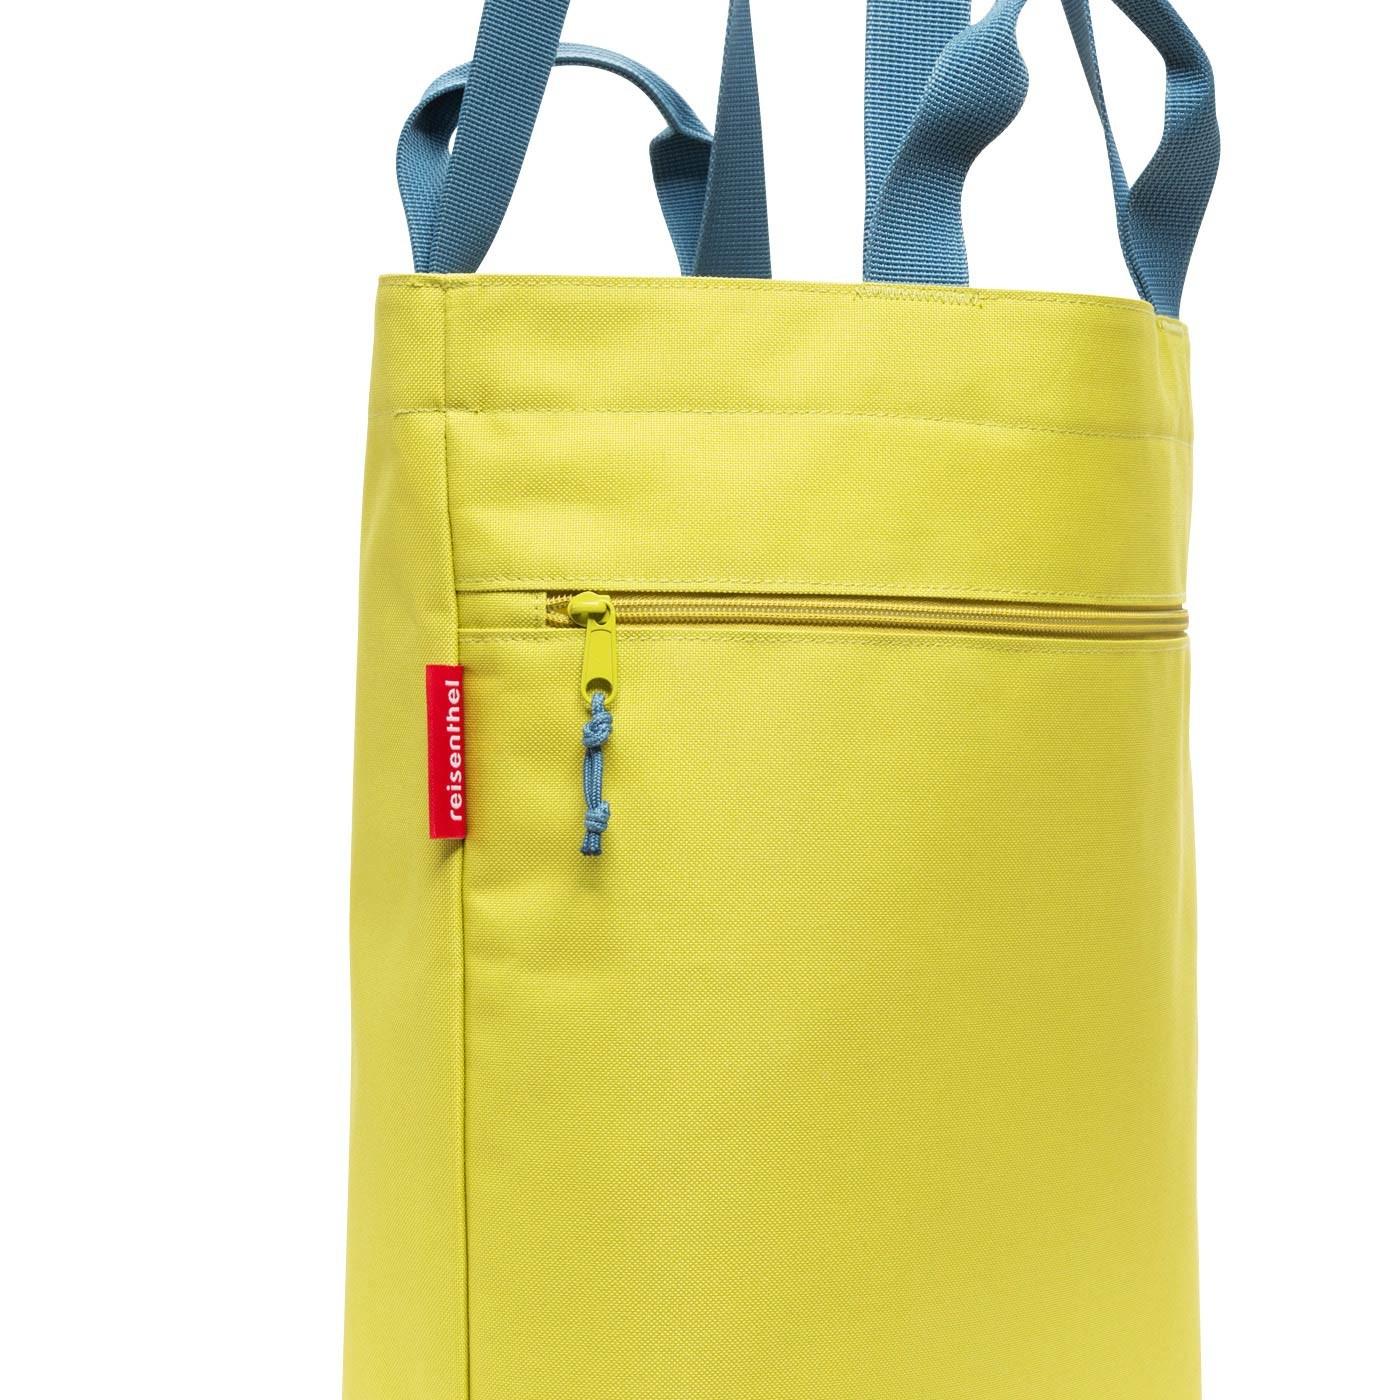 Family Bag by Reisenthel